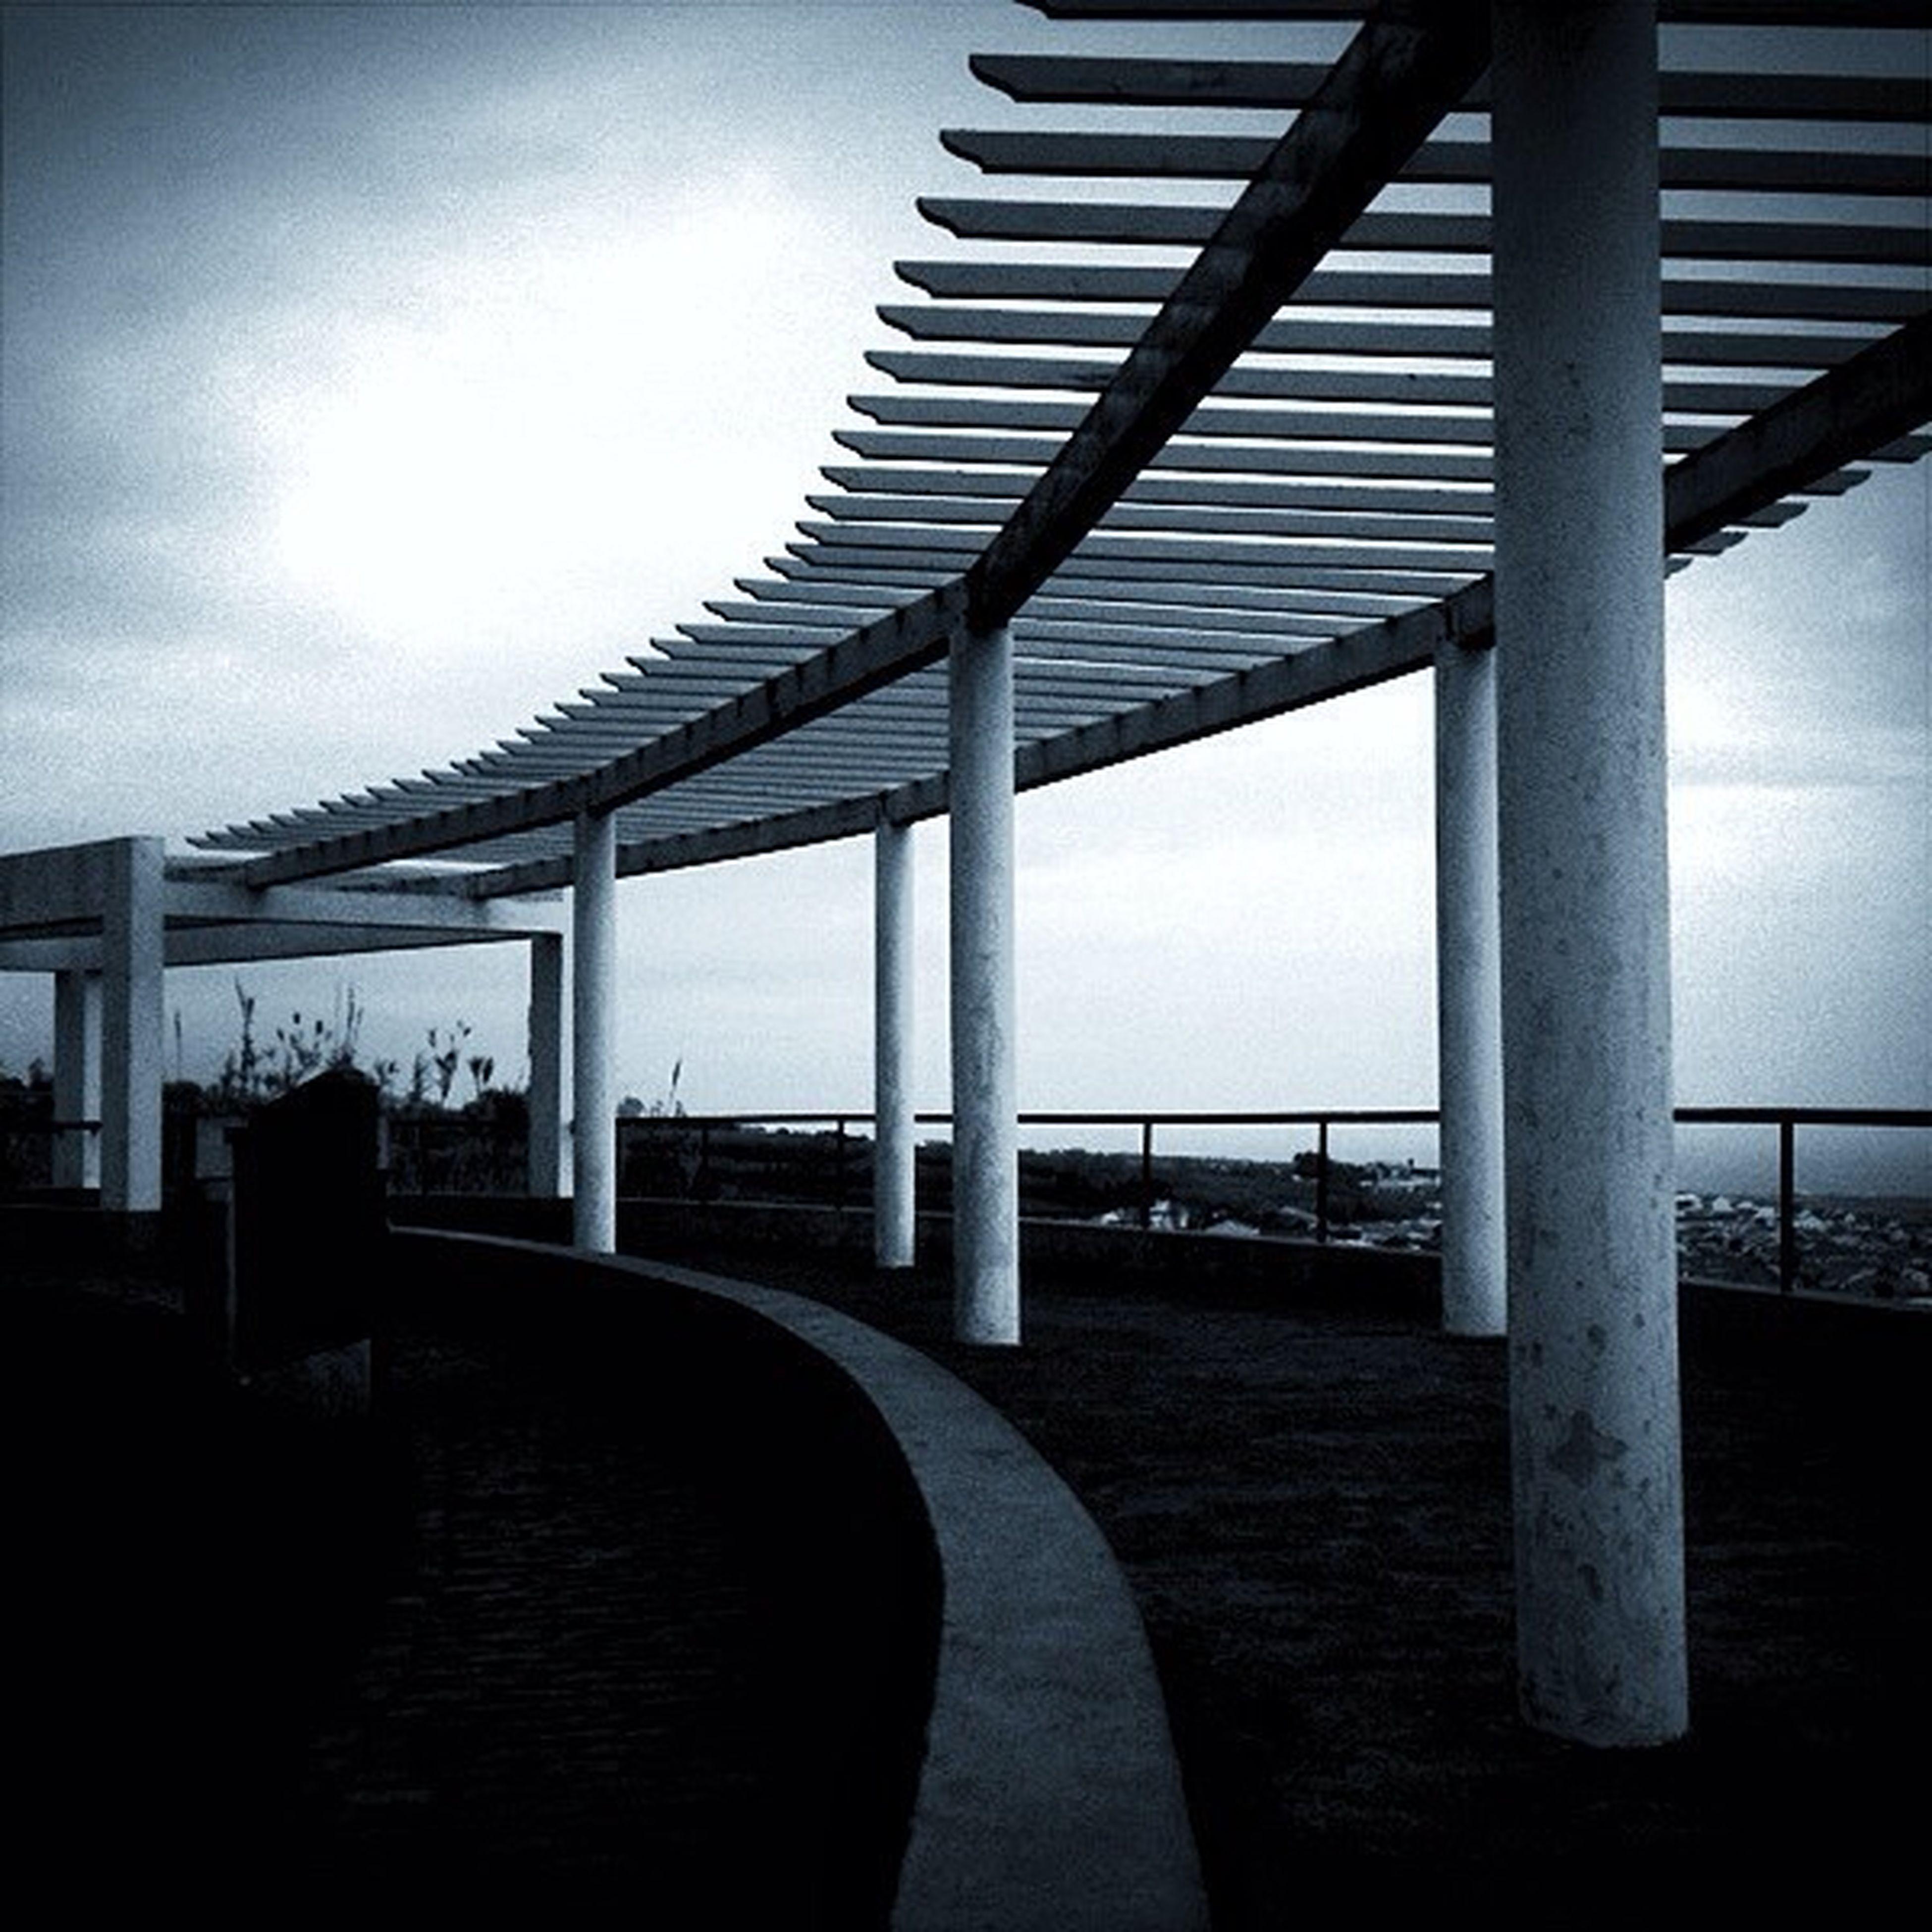 built structure, sky, architecture, sea, cloud - sky, water, railing, pier, indoors, architectural column, silhouette, empty, column, bridge, cloudy, cloud, bridge - man made structure, day, connection, nature